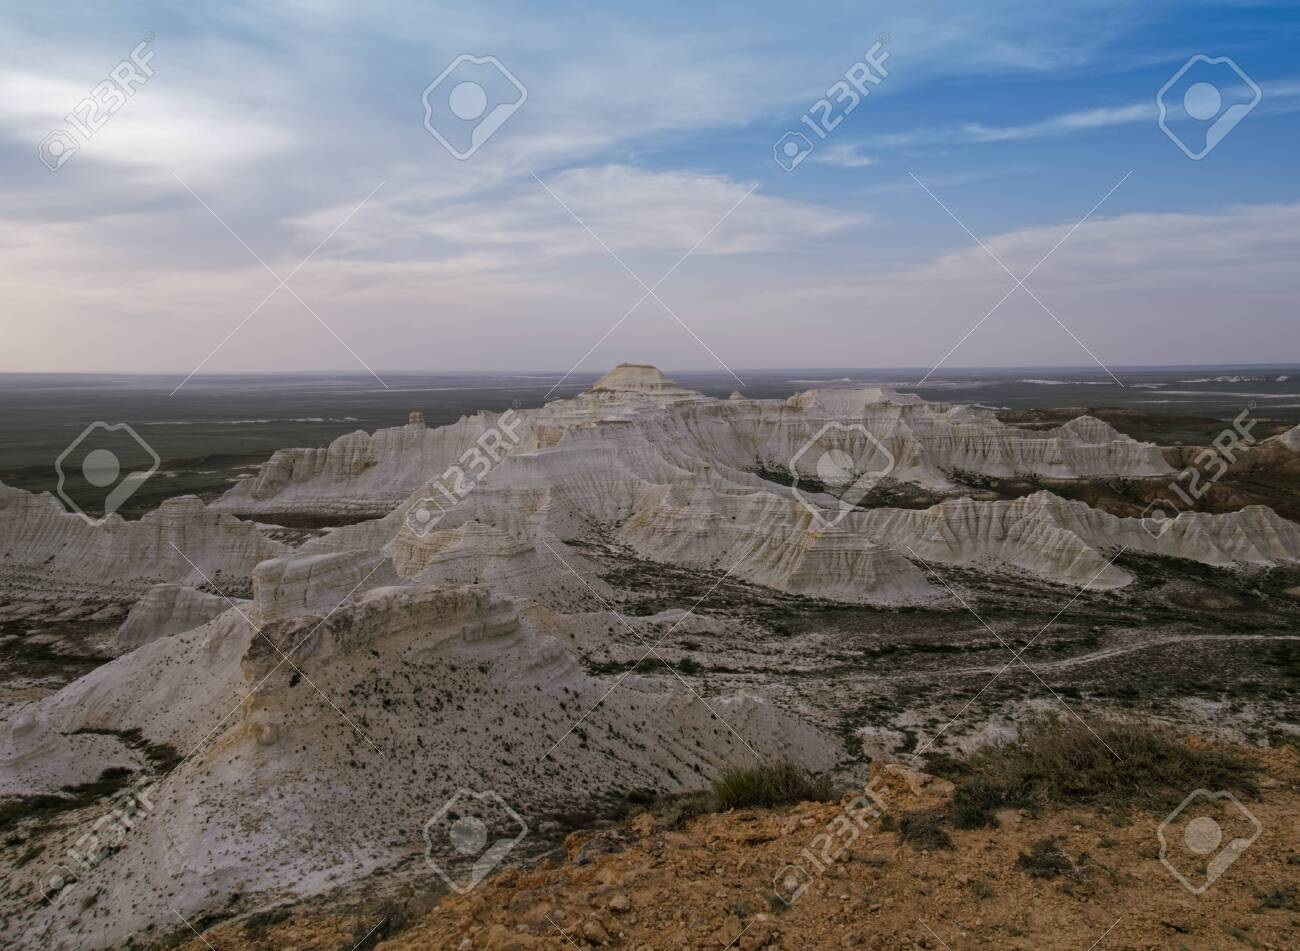 Chalk cliffs and ledges of the plateau Aktolagai. Plateau Aktolagai, Kazakhstan 2019.Expedition site Turister.ru. - 142655259